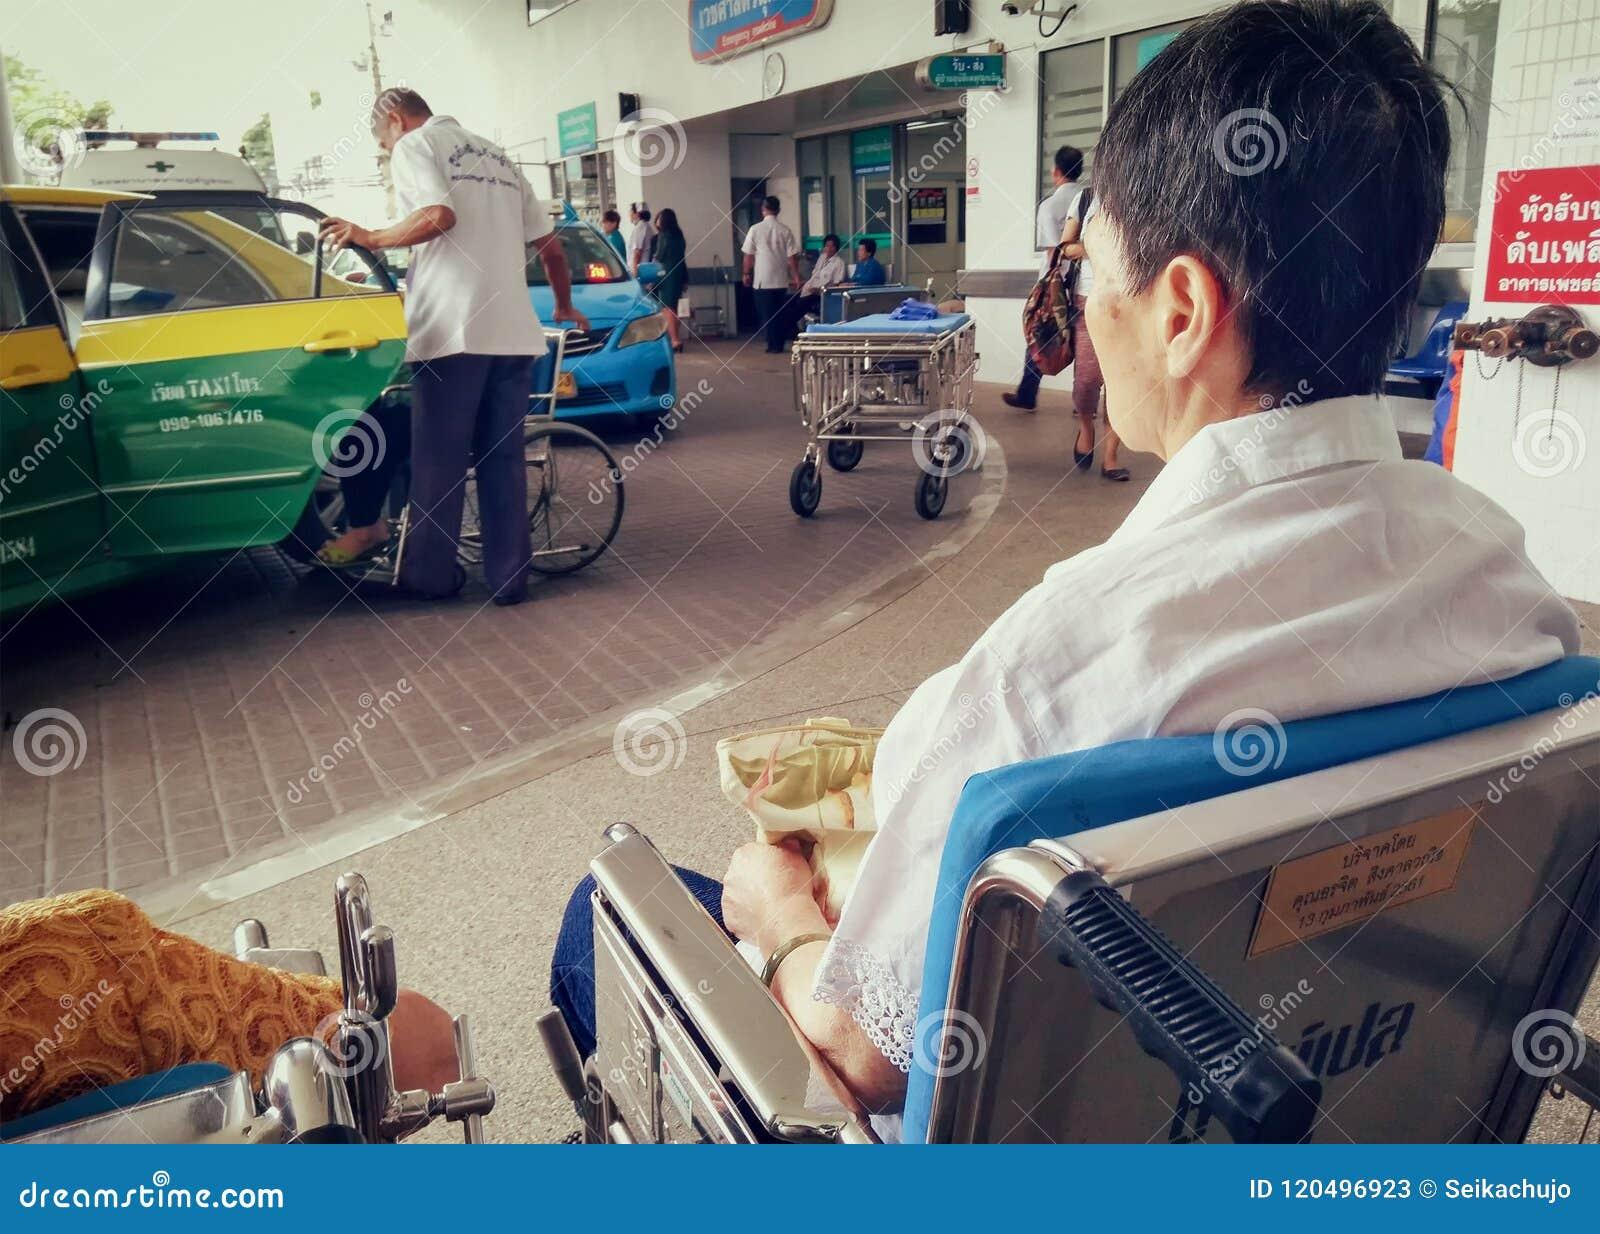 BANGKOK, THAILAND - JUNE 21: An unidentified elderly waits for t